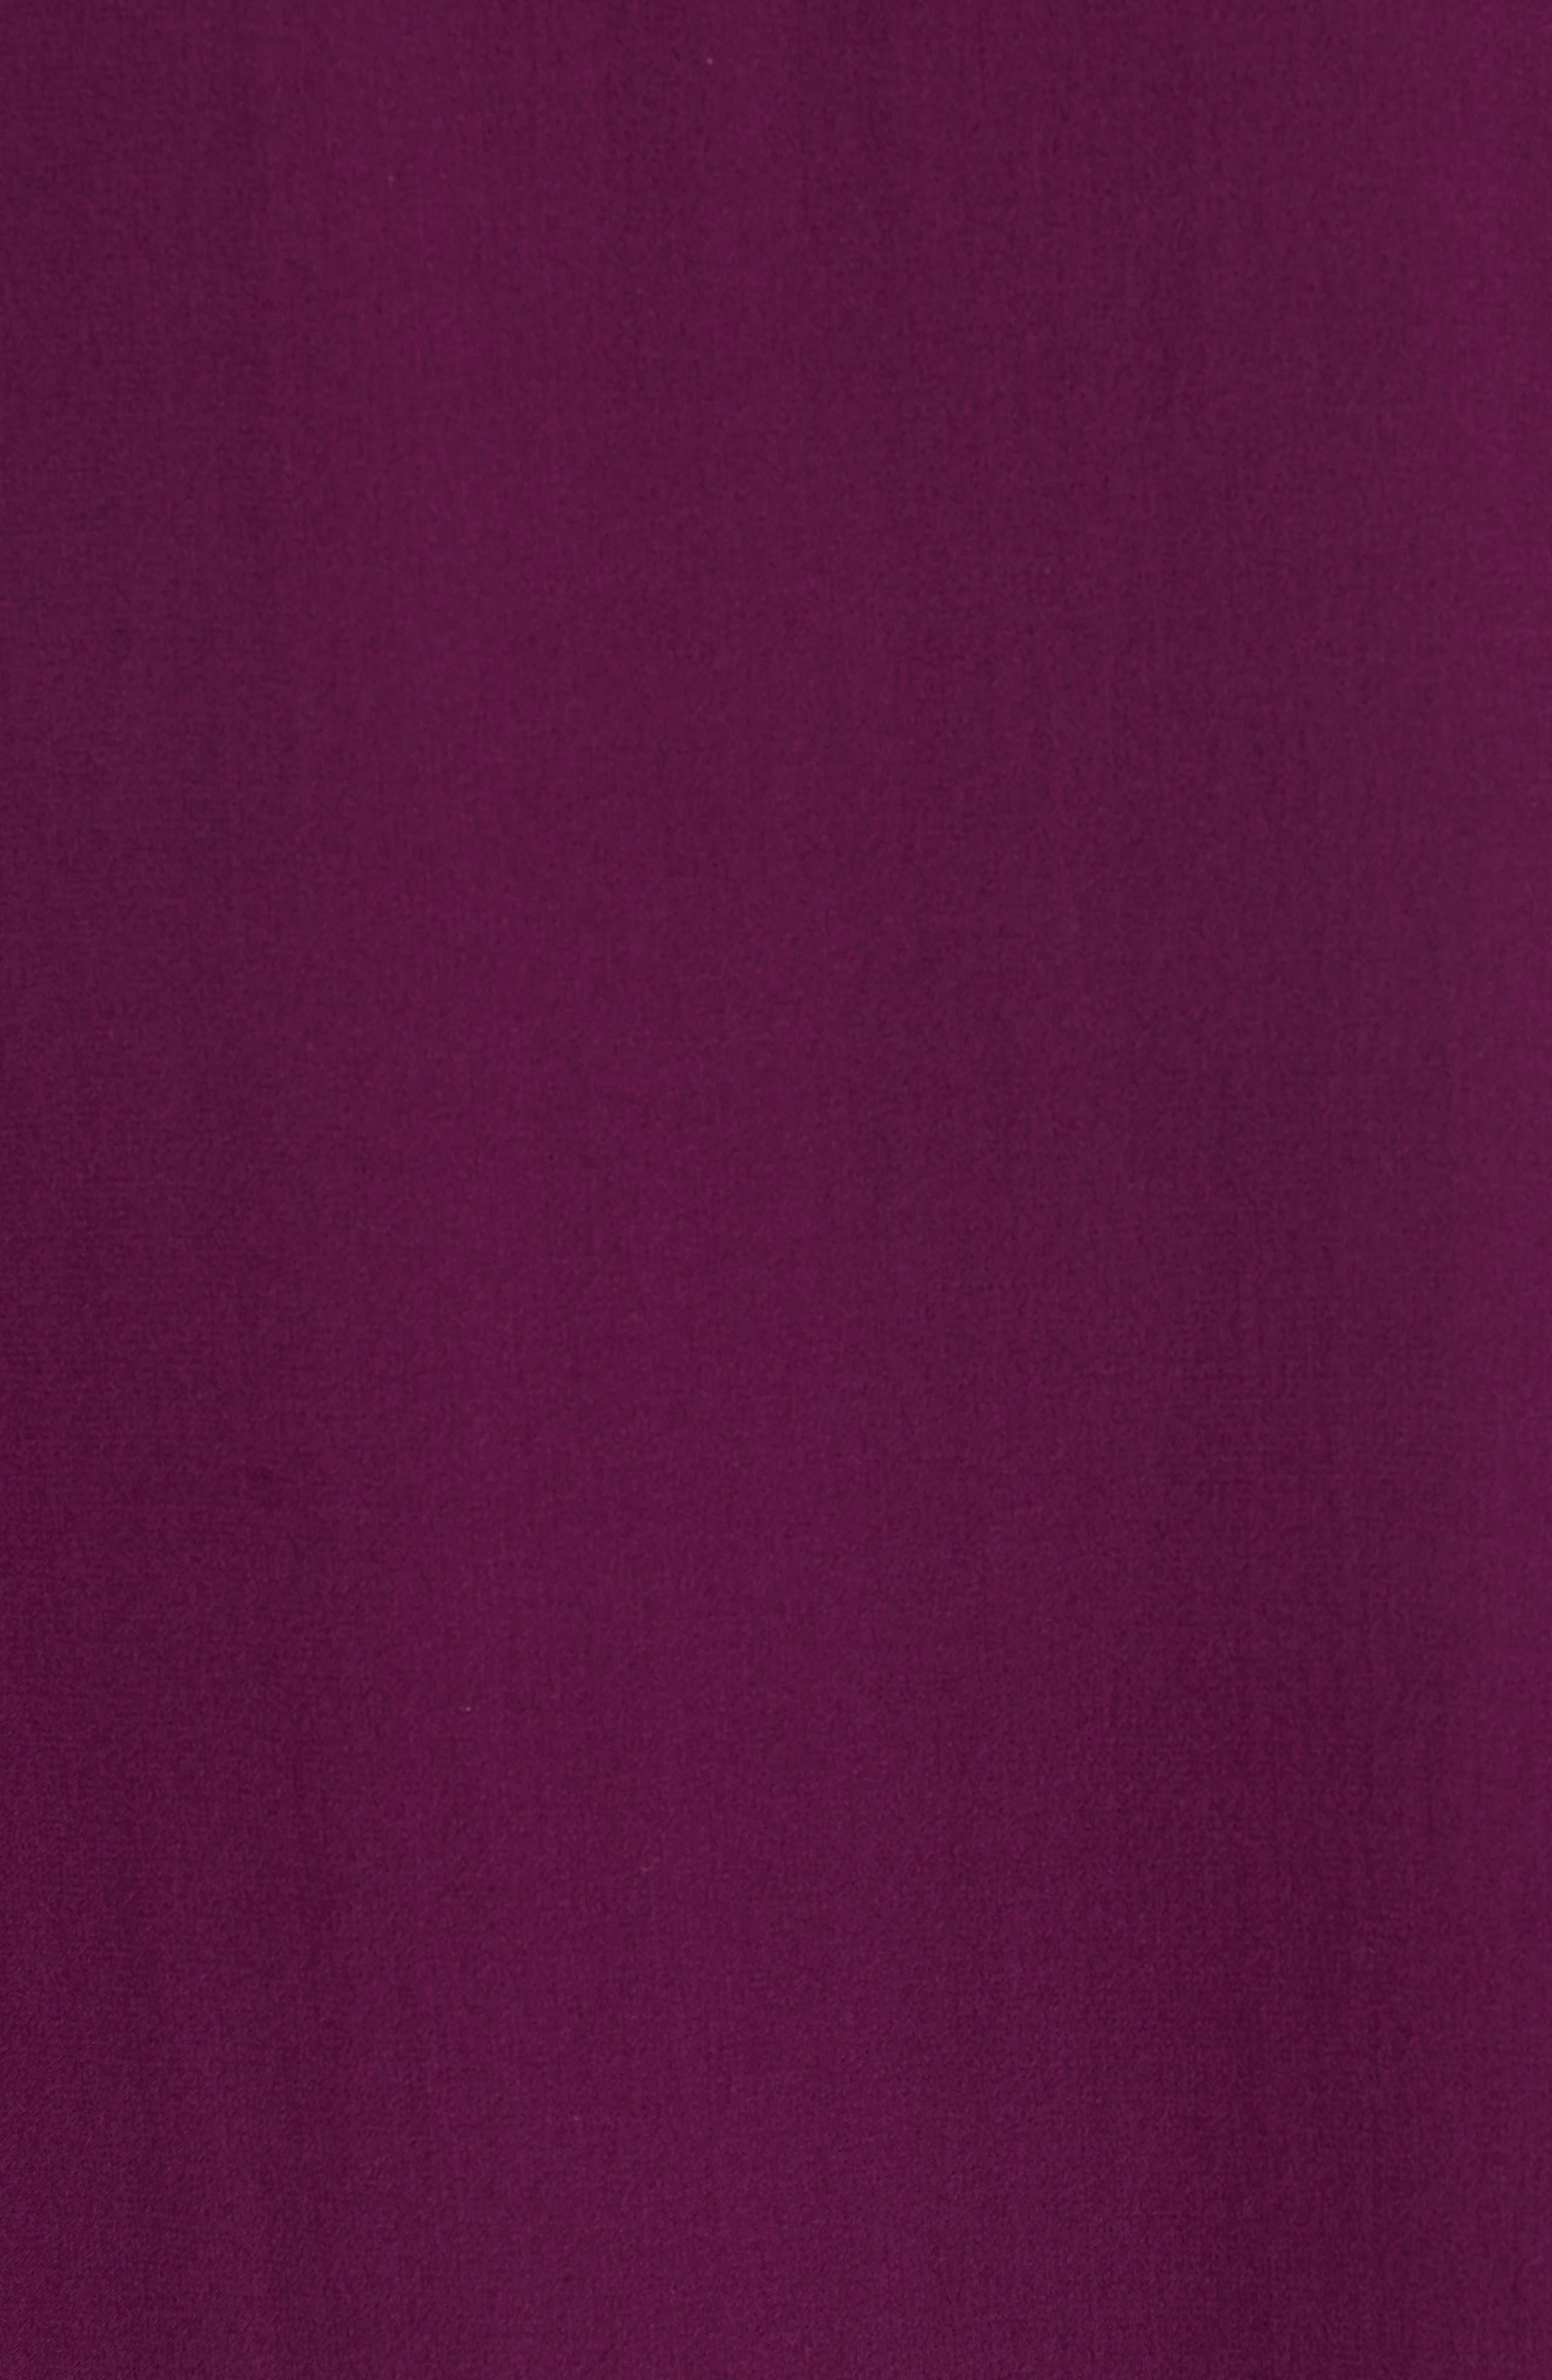 Sheer Silk Georgette Top,                             Alternate thumbnail 5, color,                             Boysenberry